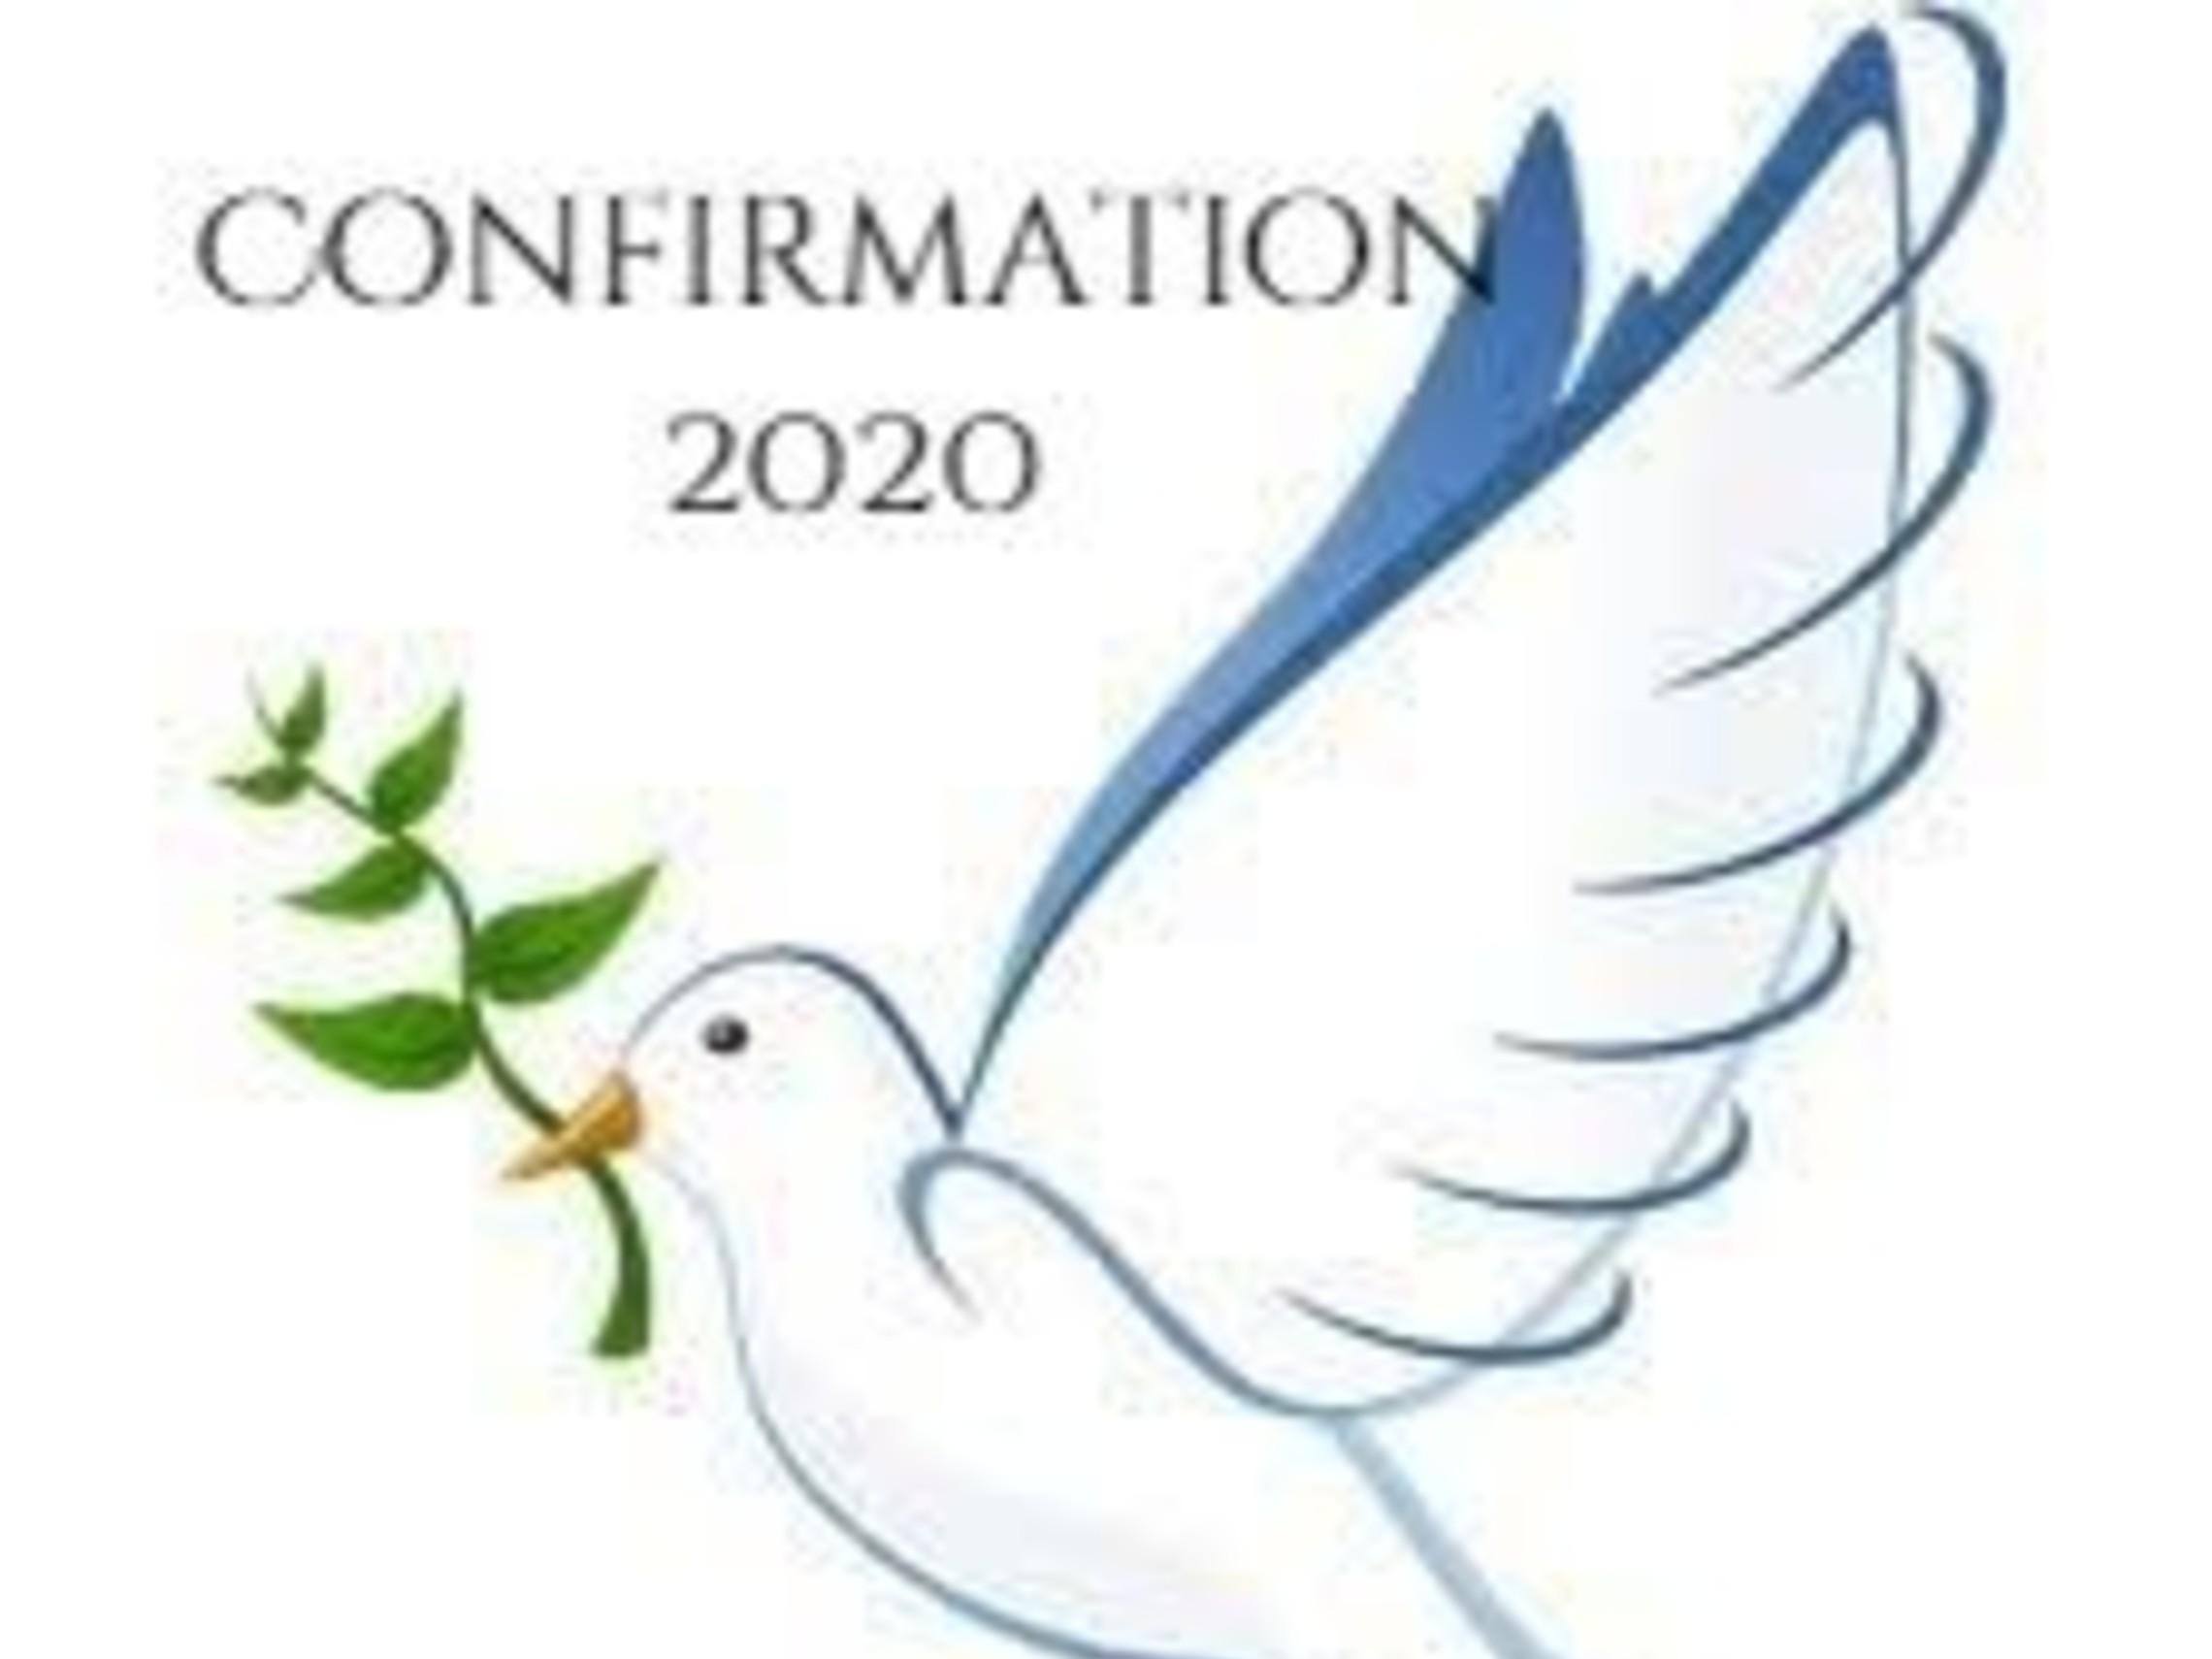 Confirmation 2020